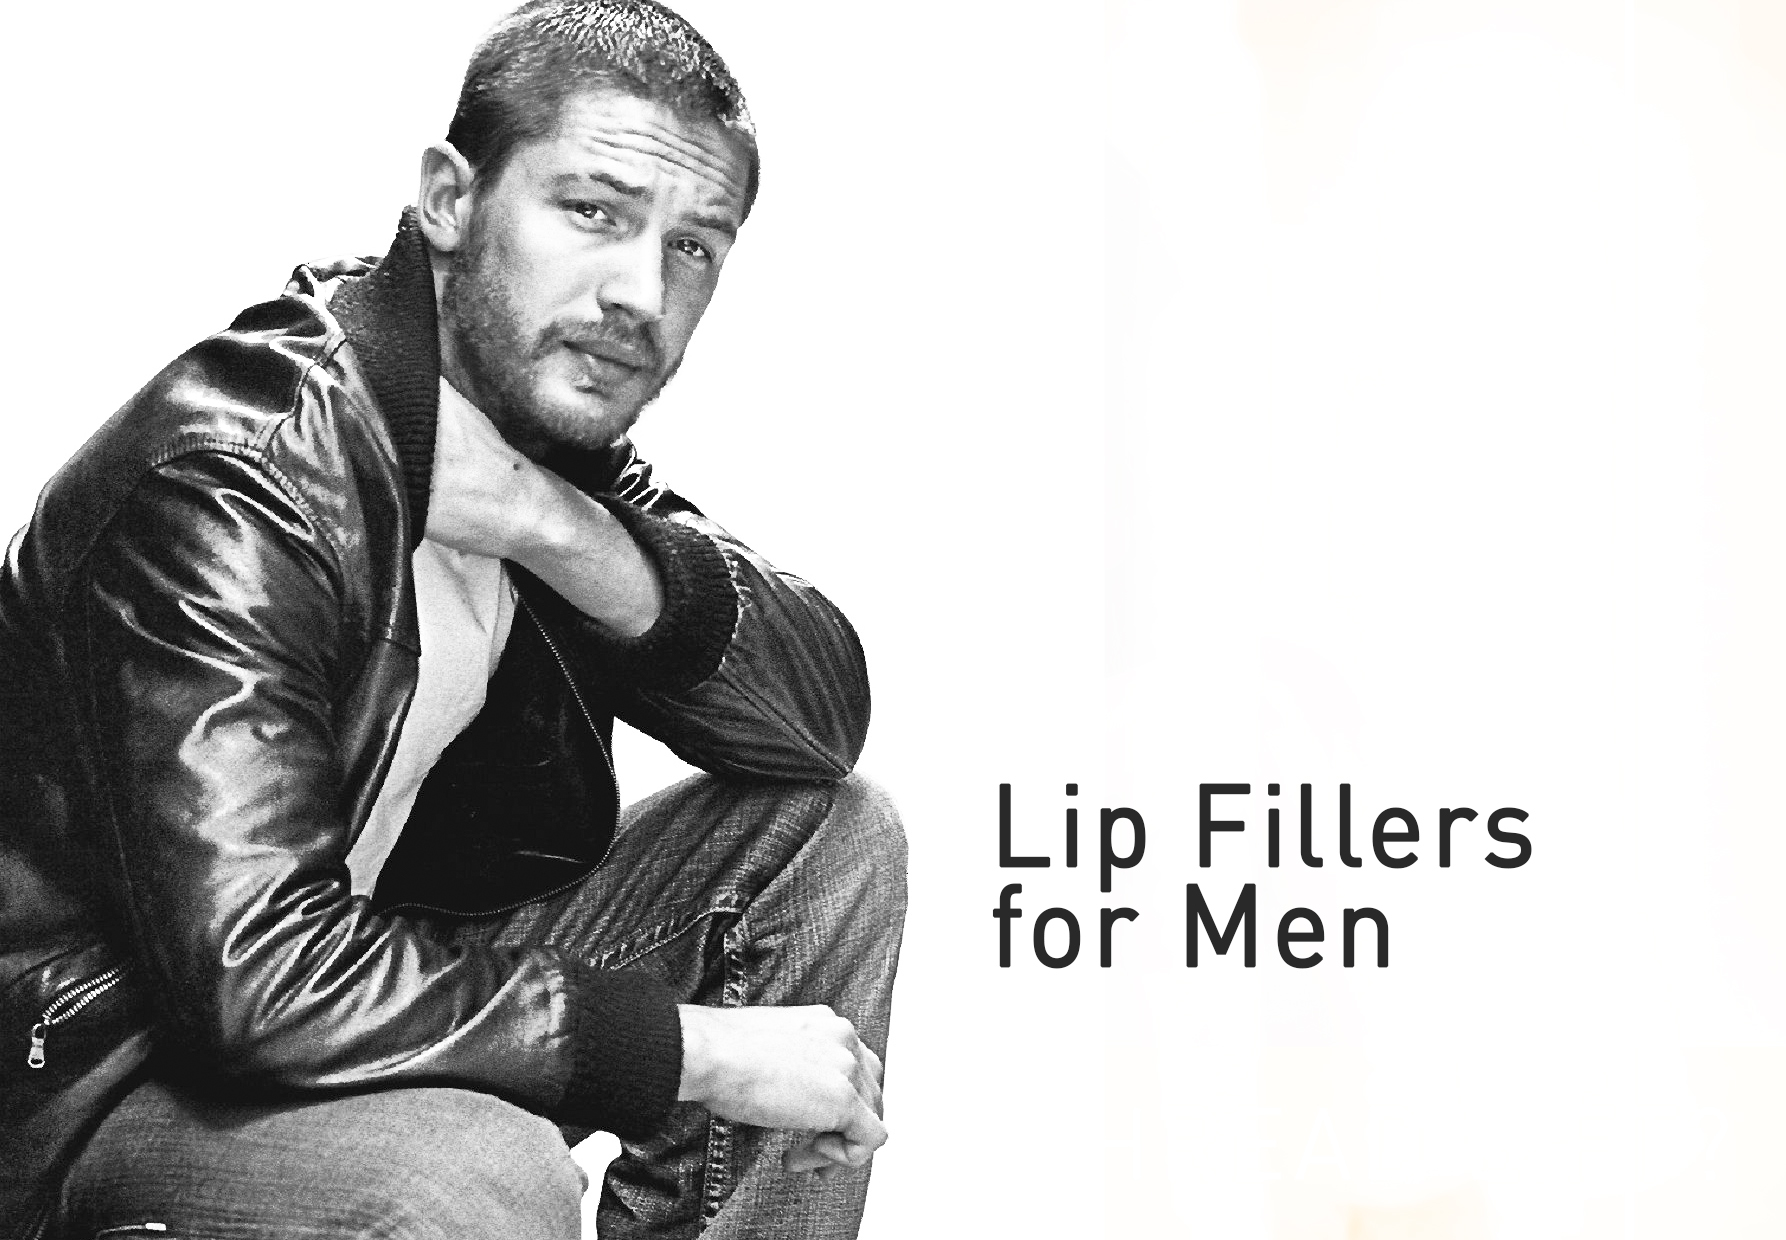 lip fillers for men